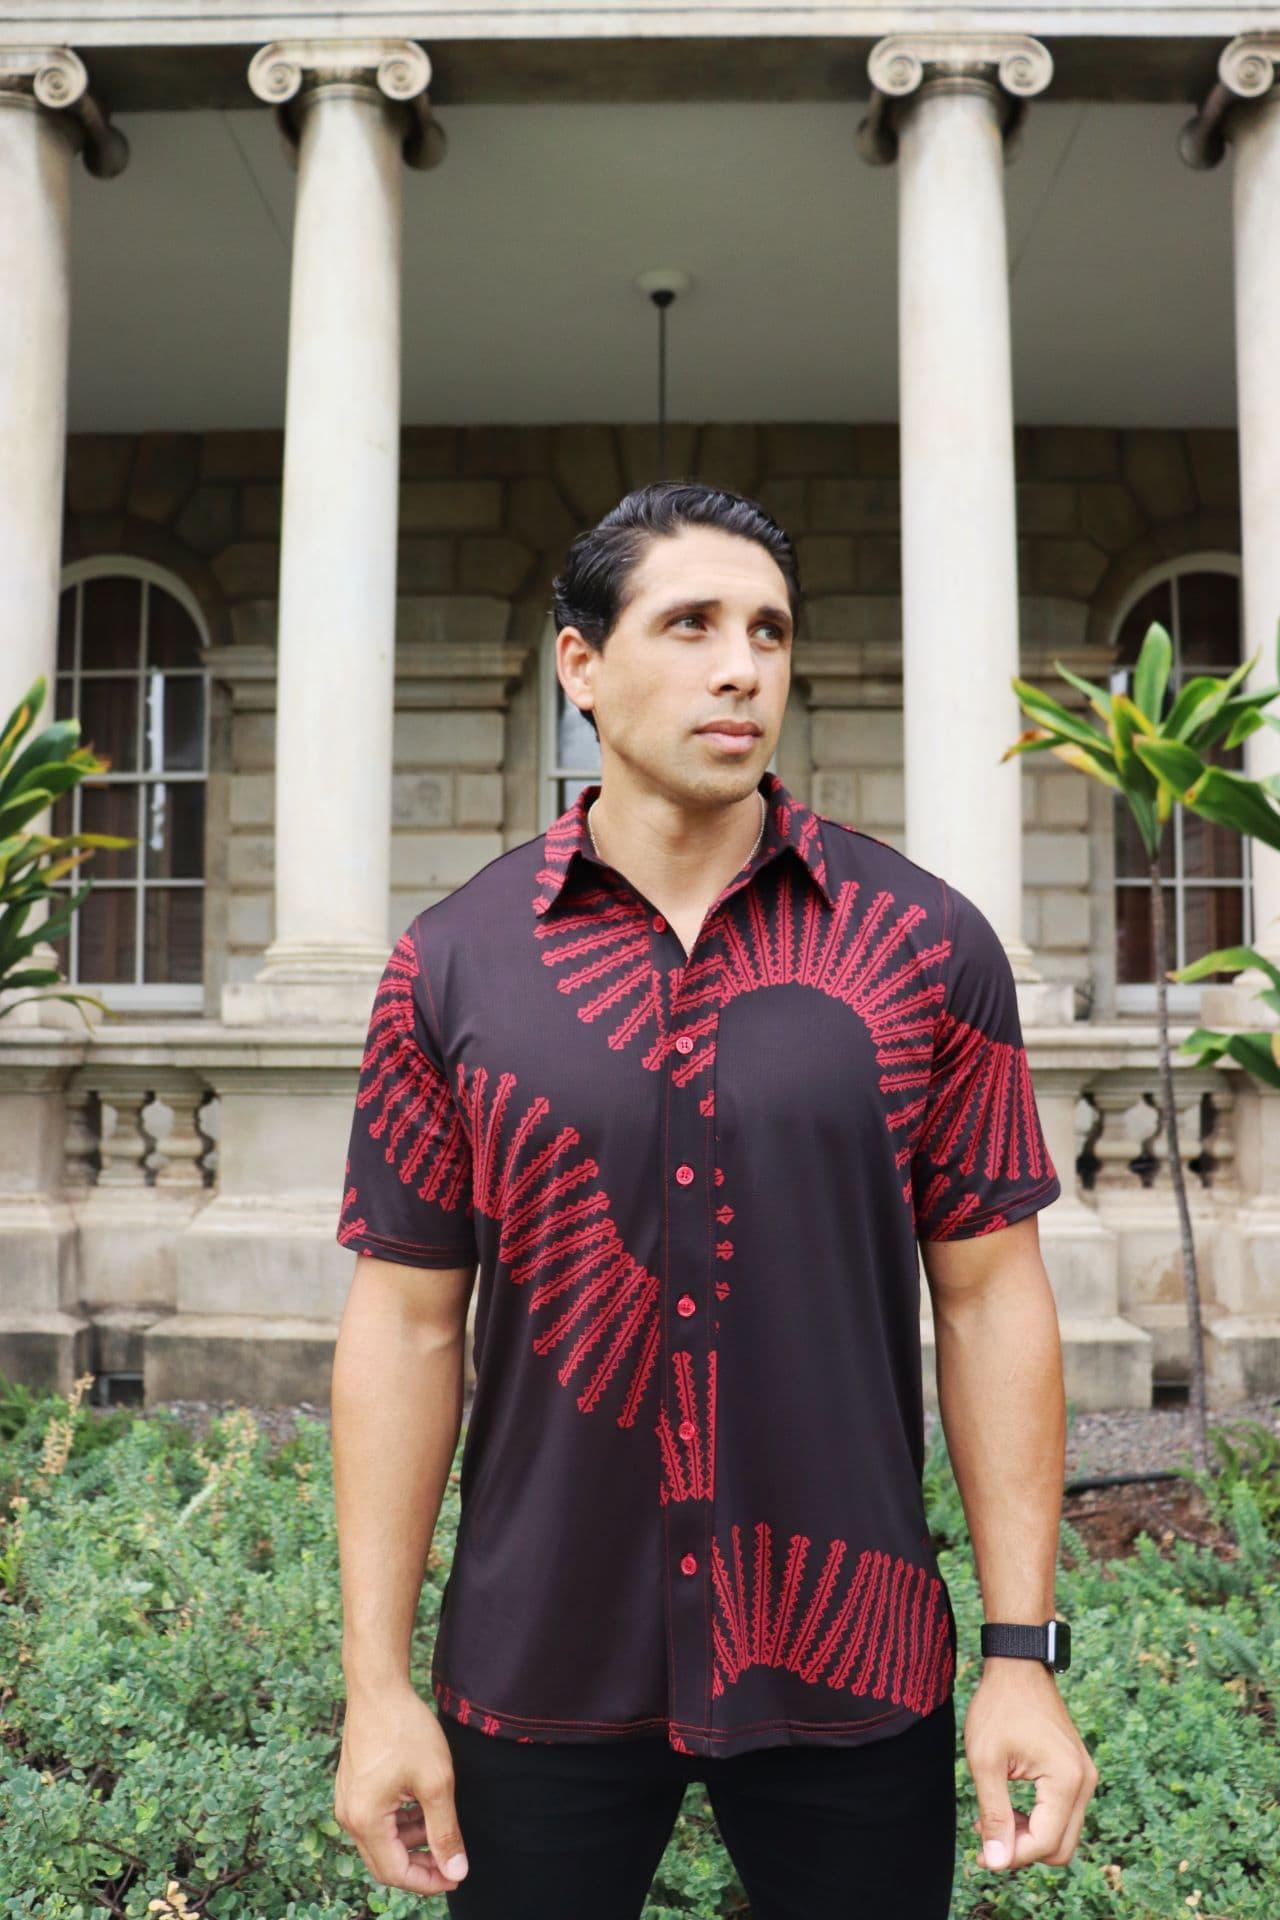 Male model wearing Golf Aloha Shirt in Brick Red/Deepwell Lalanikalea